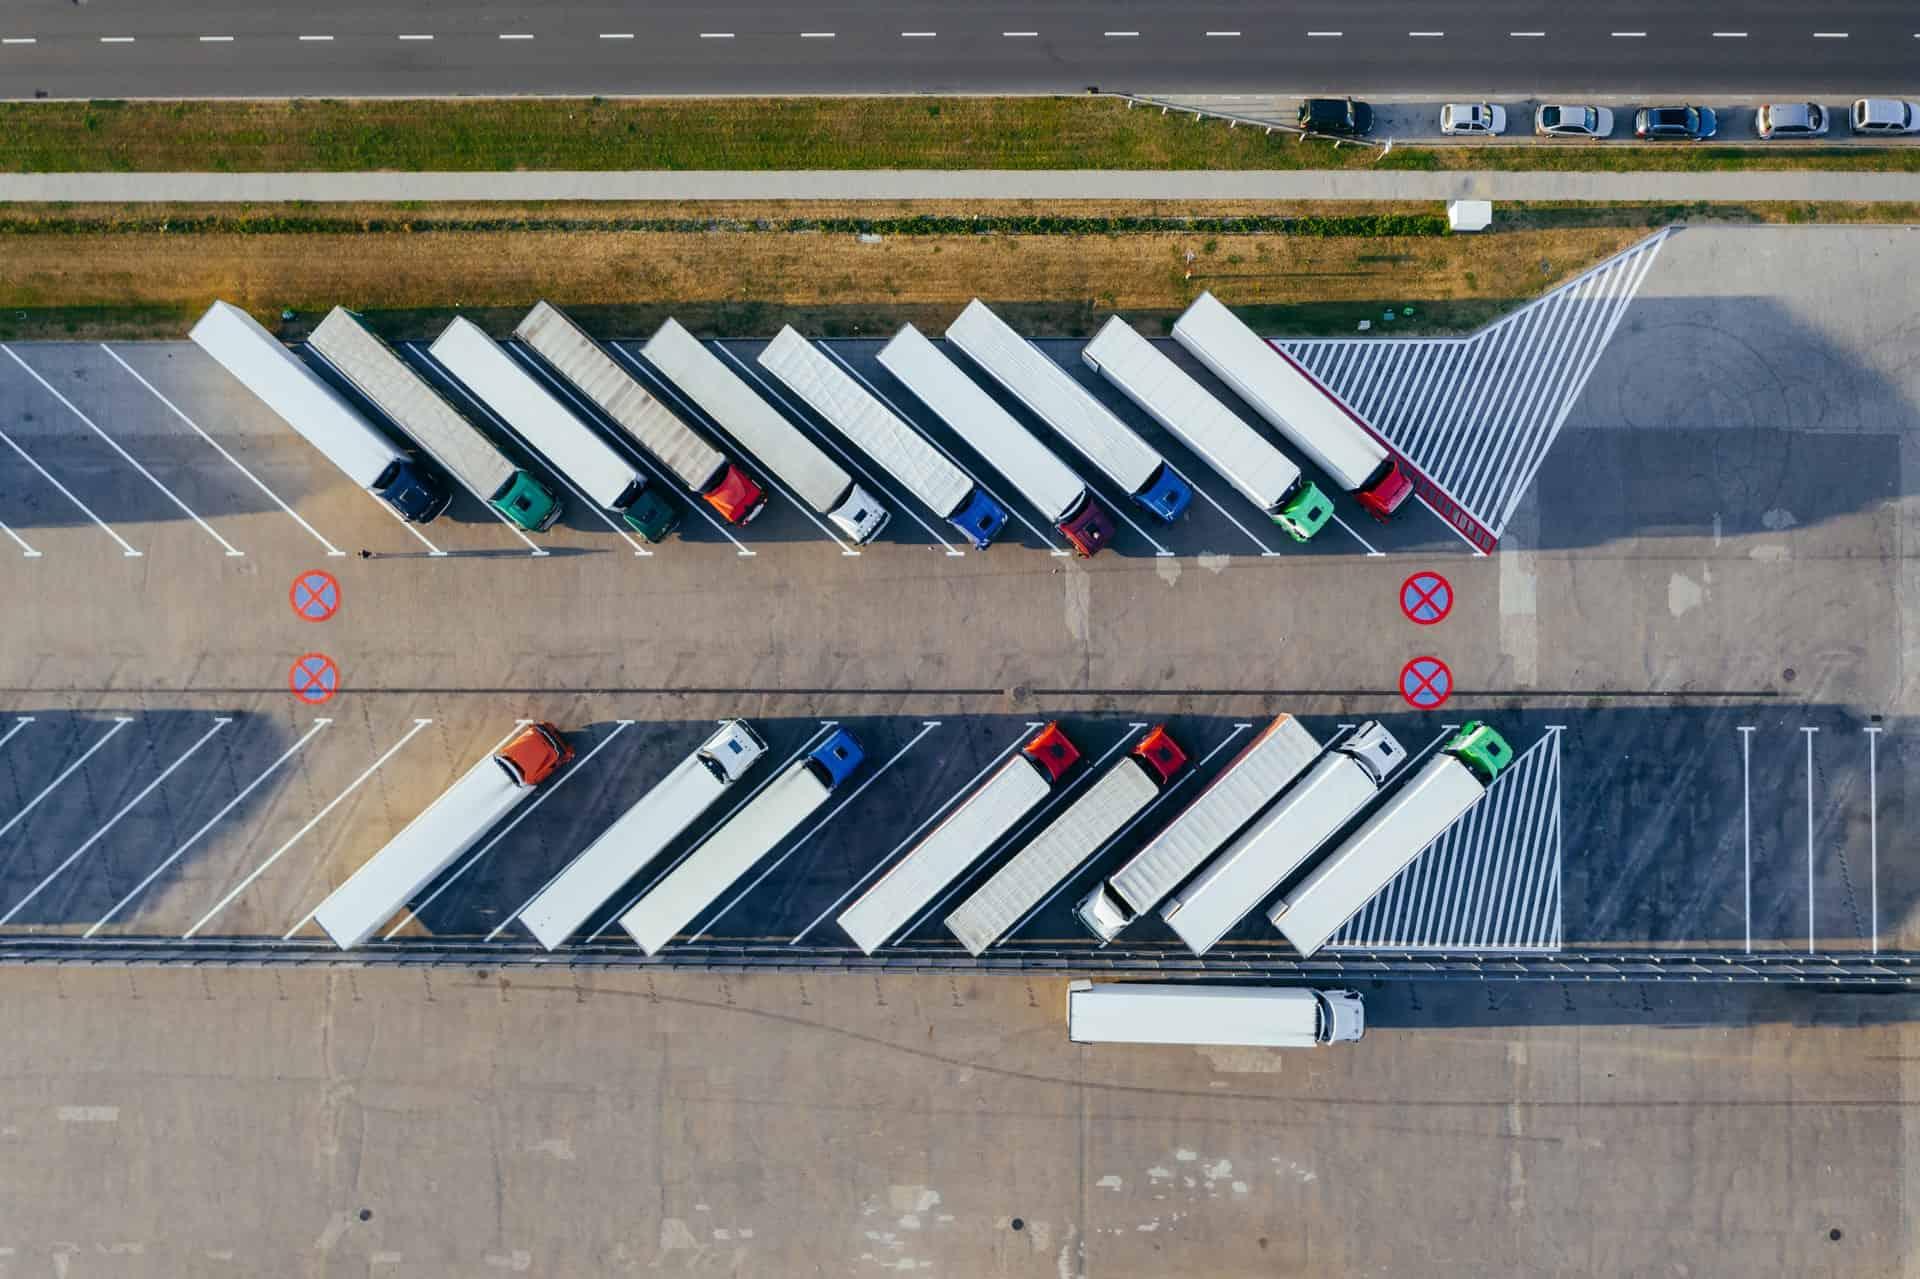 Bird's eye view of parked trucks